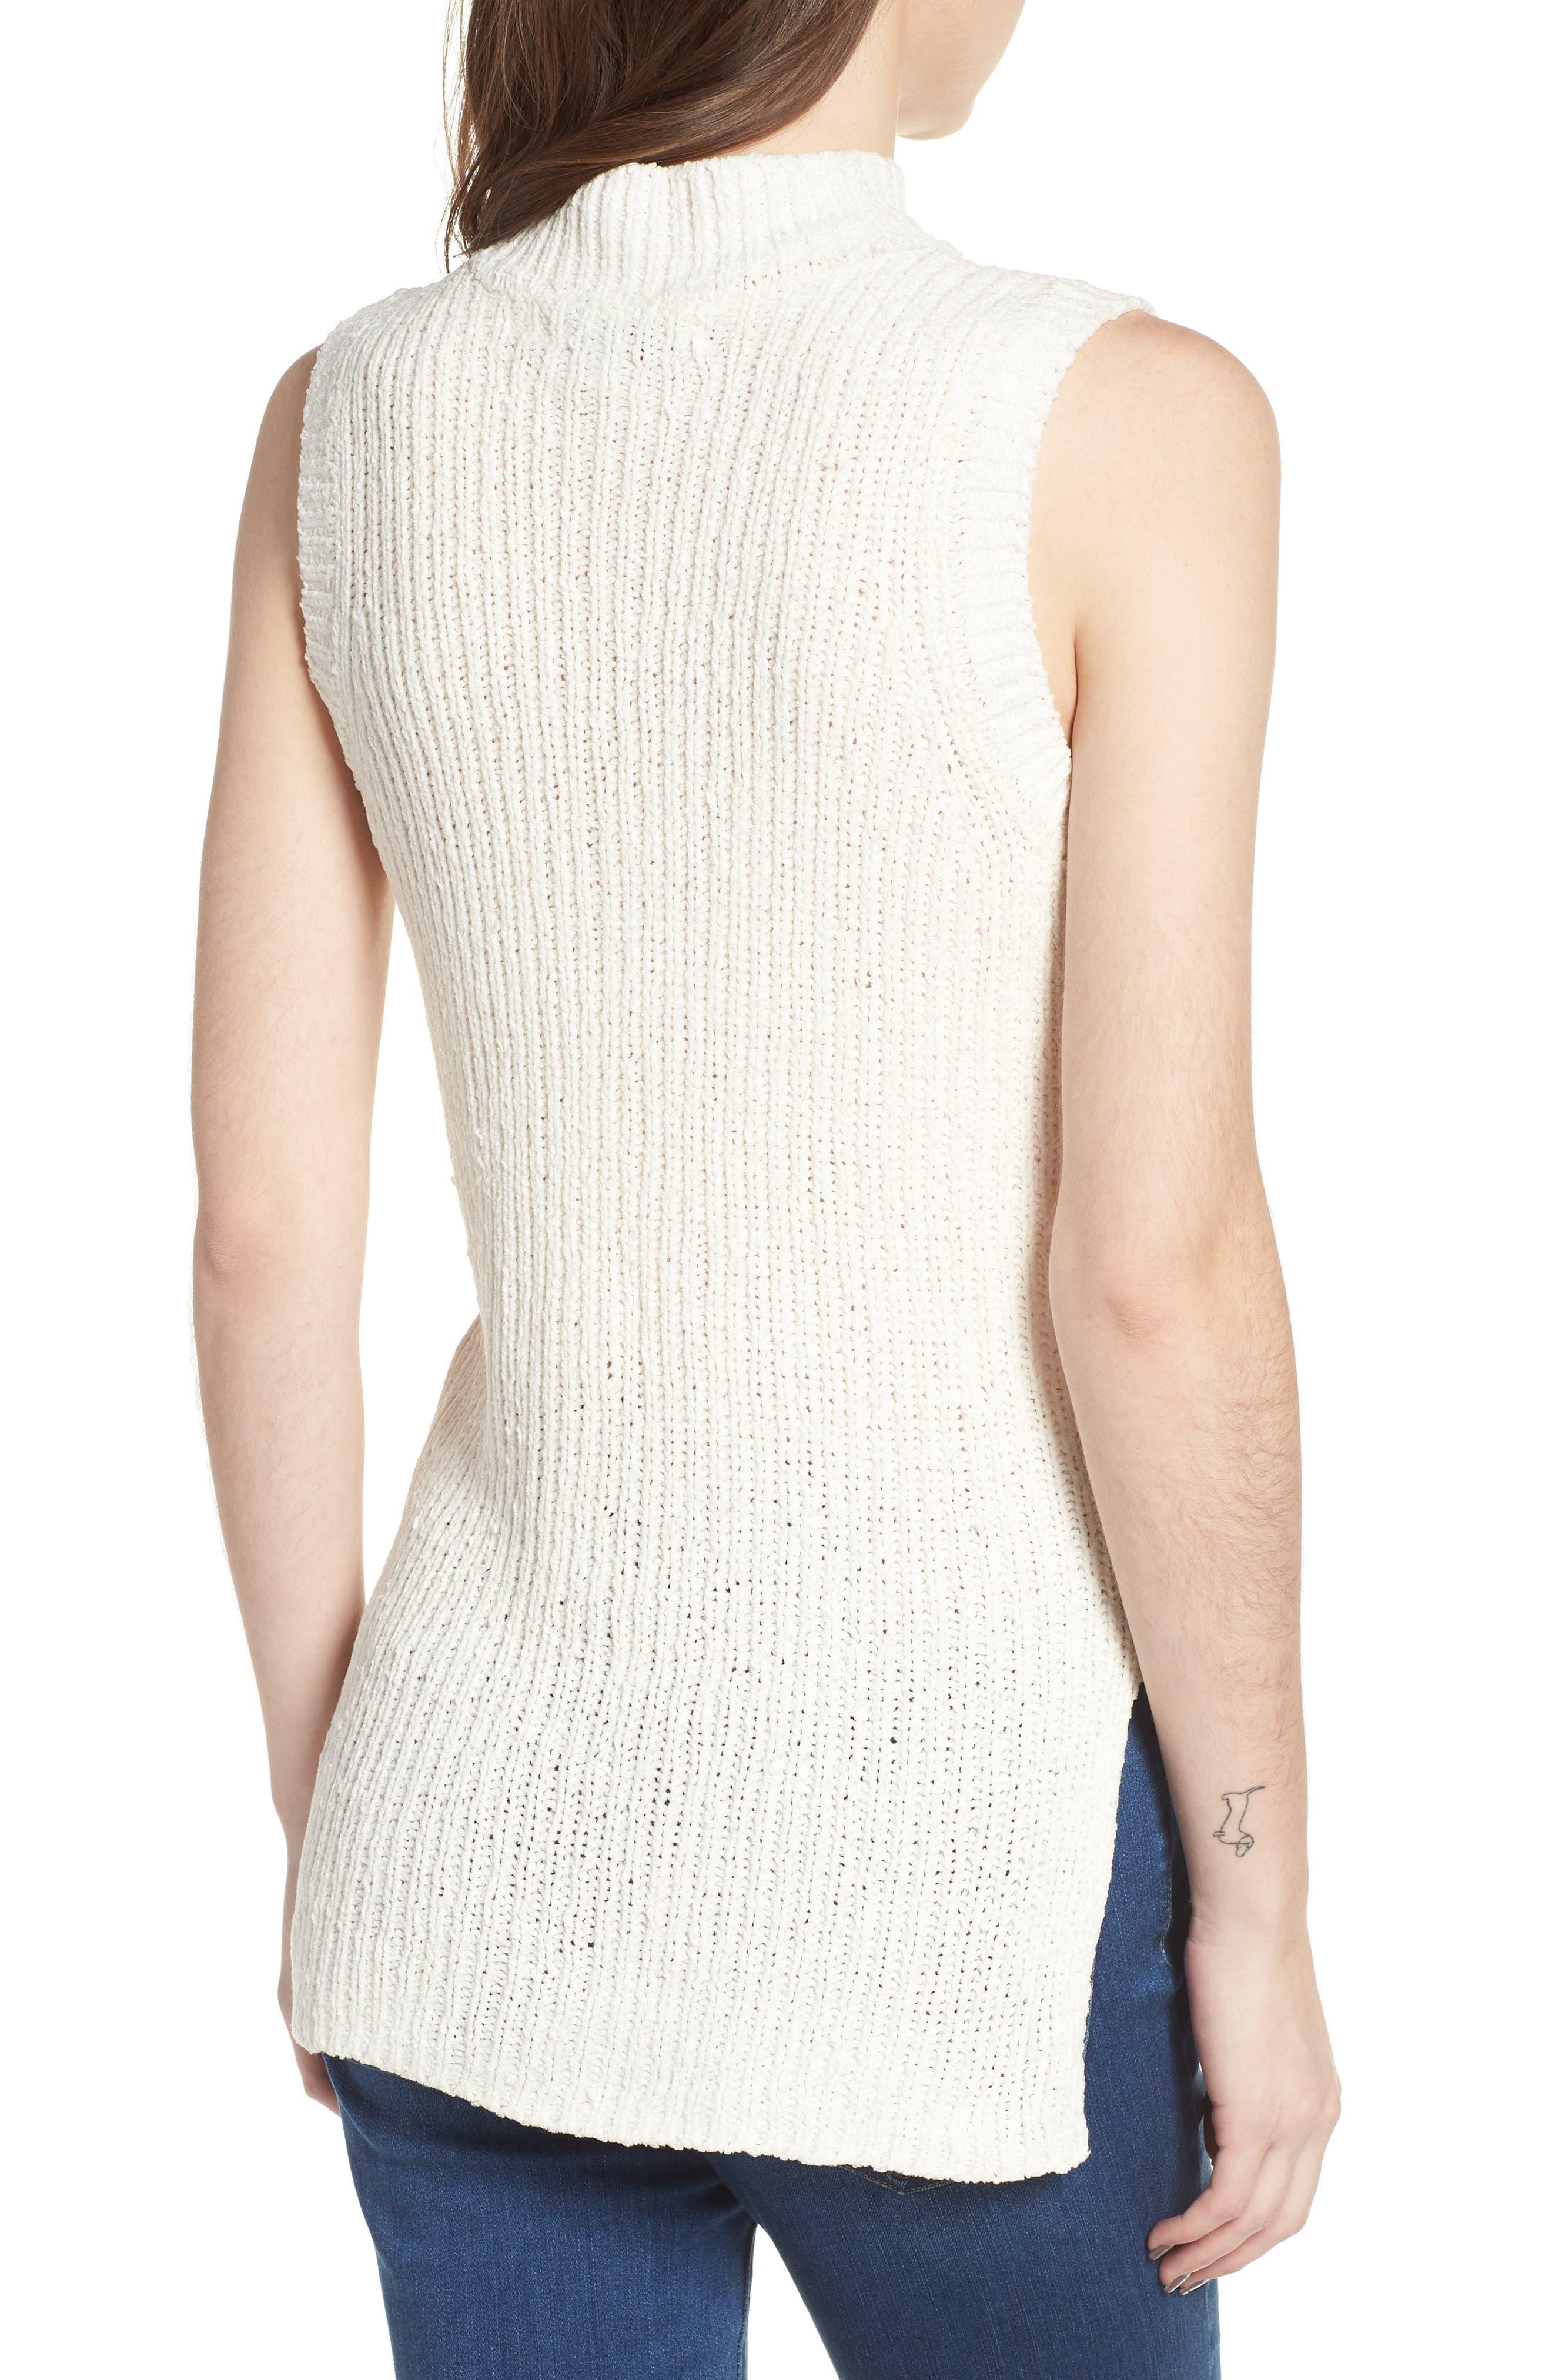 Camdon Sleeveless Sweater,                             Alternate thumbnail 2, color,                             Ivory